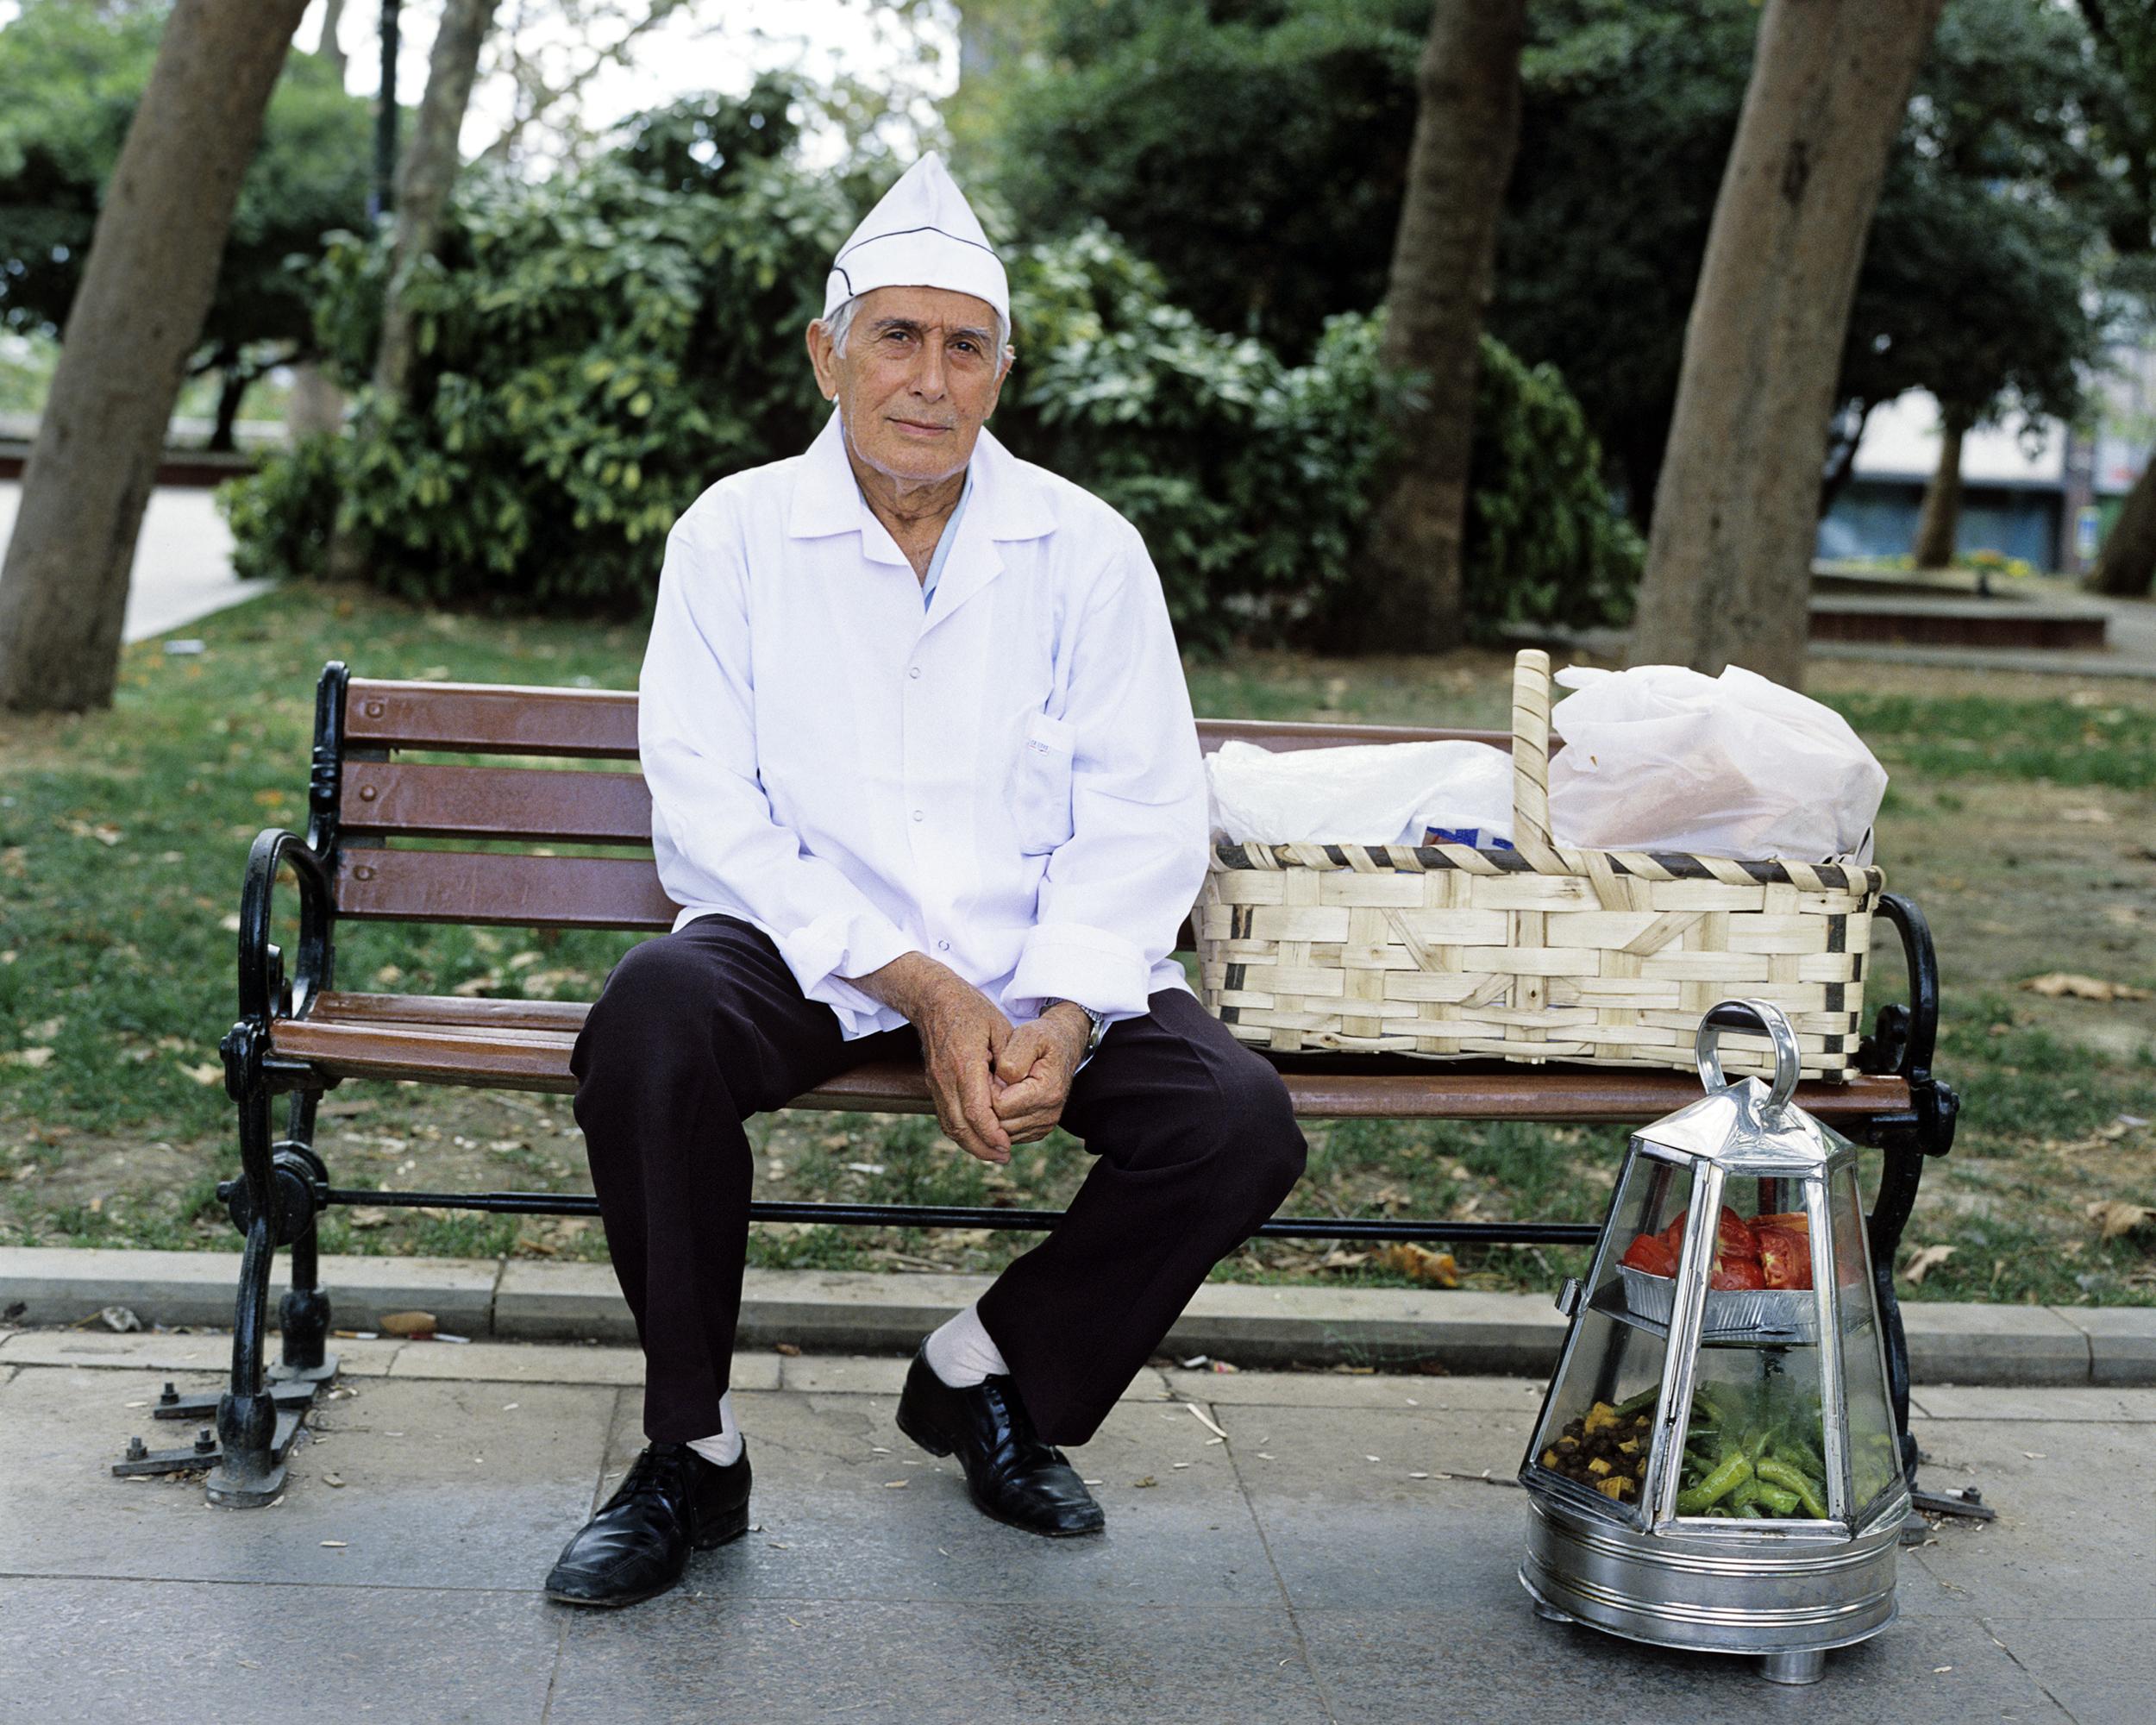 GeziPark _Istanbul_05Web_D6 _08-09 Gezi Park_16_copyright Claudia Leisinger.jpg